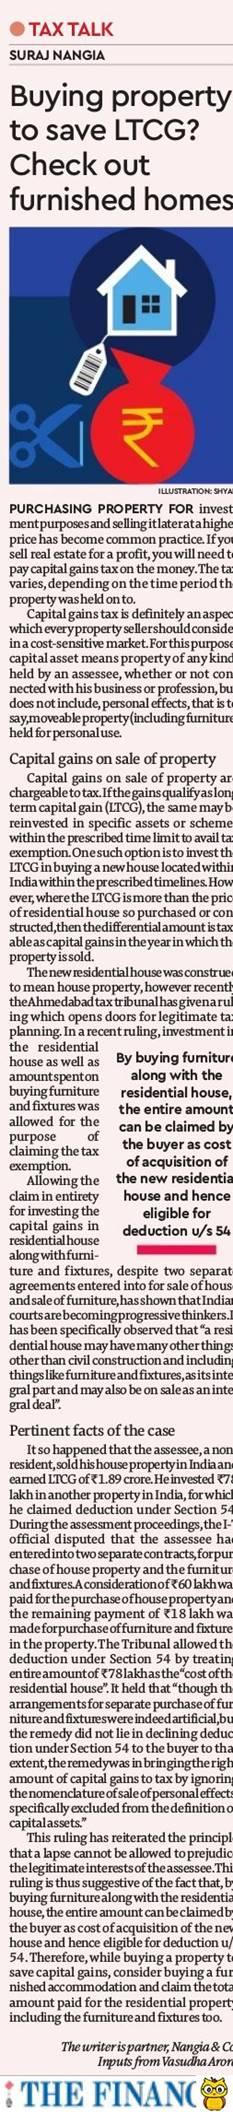 tax-talk-buying-property-to-save-ltcg-suraj-nangia